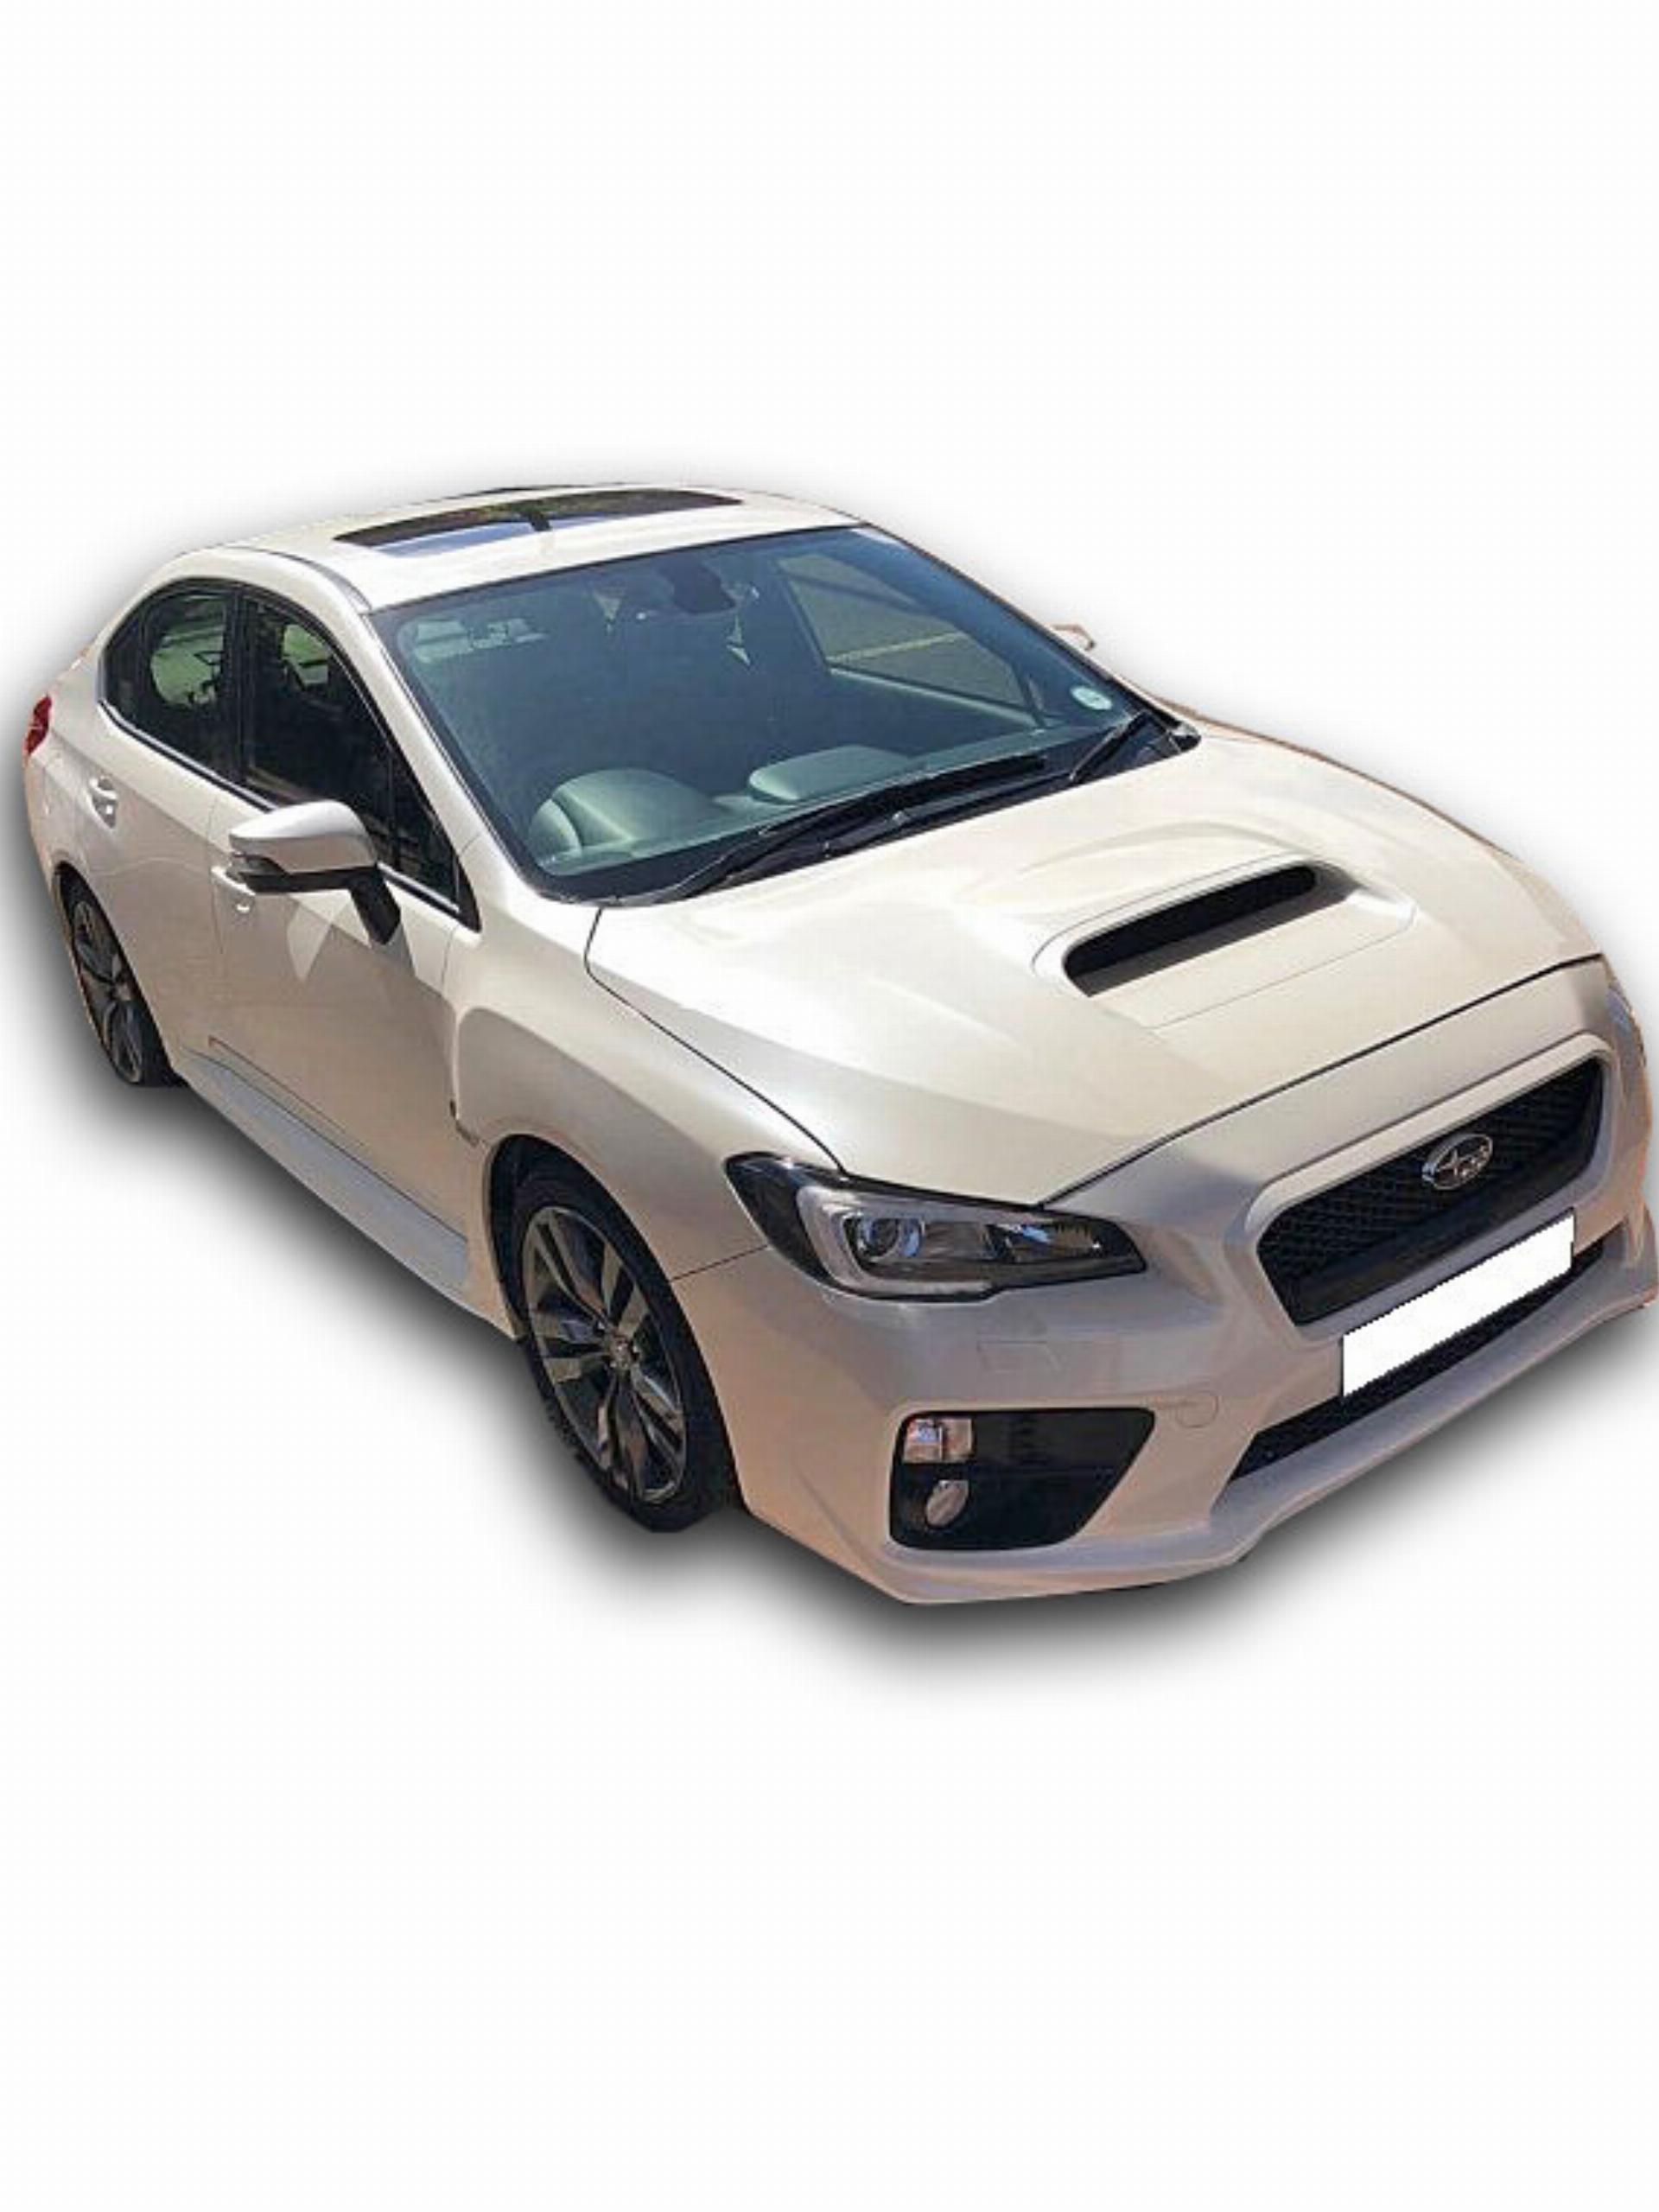 Subaru Impreza WRX Premium 2.0T Lineartronic